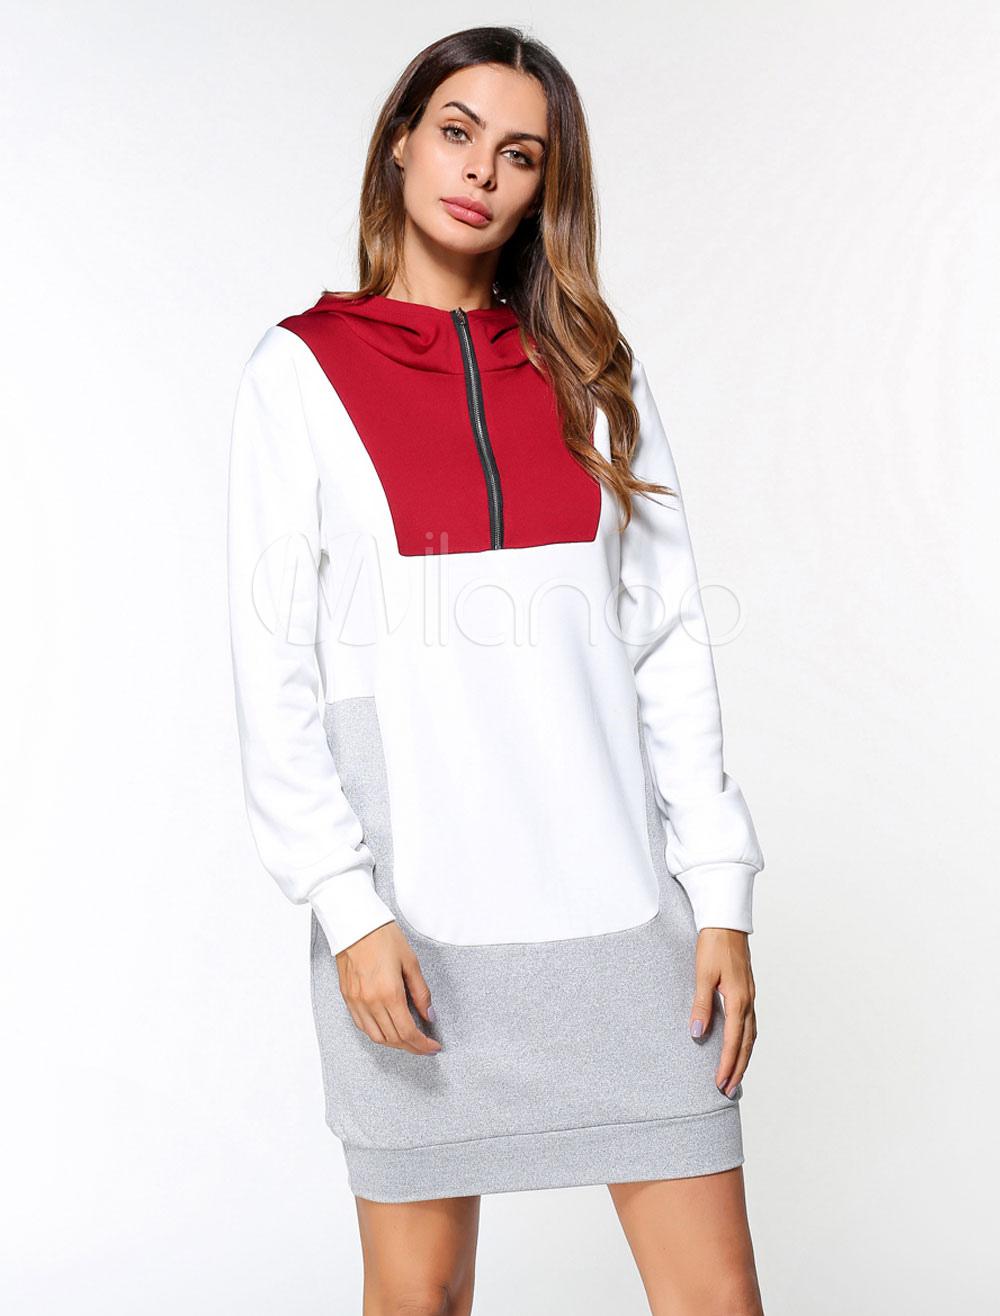 Buy White Shift Dress Hooded Zipper Color Block Women Long Sleeve Dress for $23.74 in Milanoo store